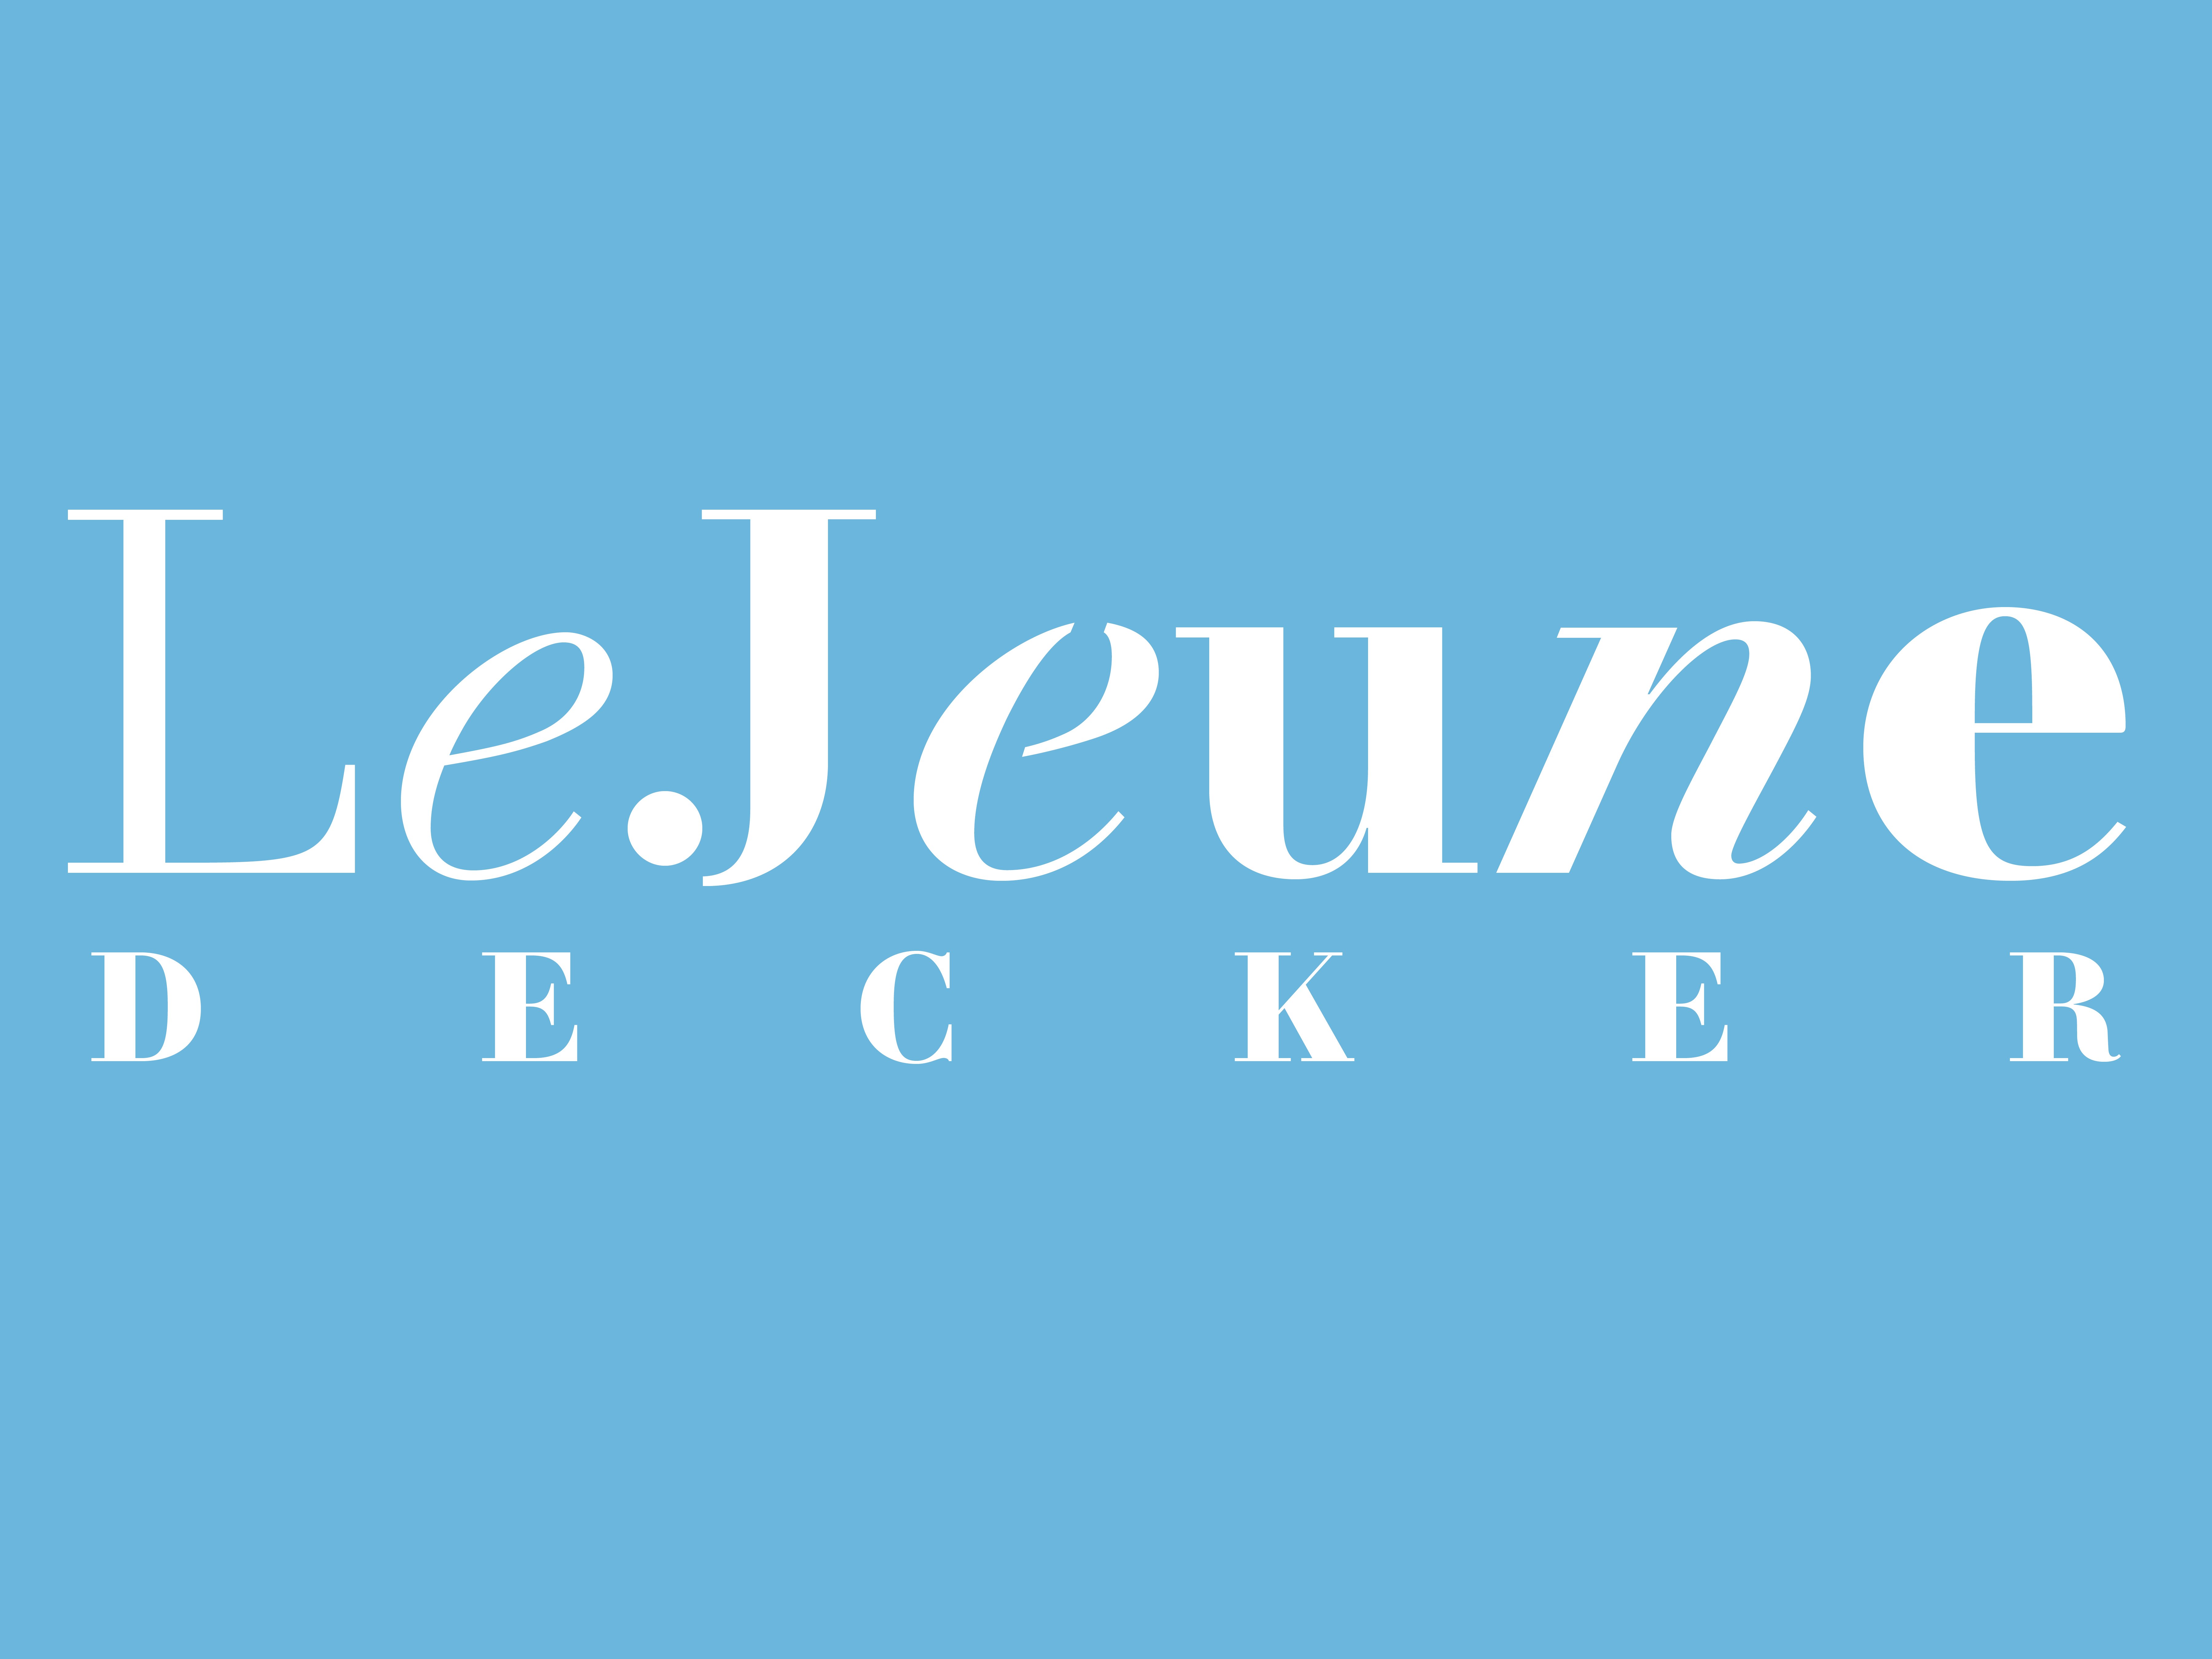 LeJeune22